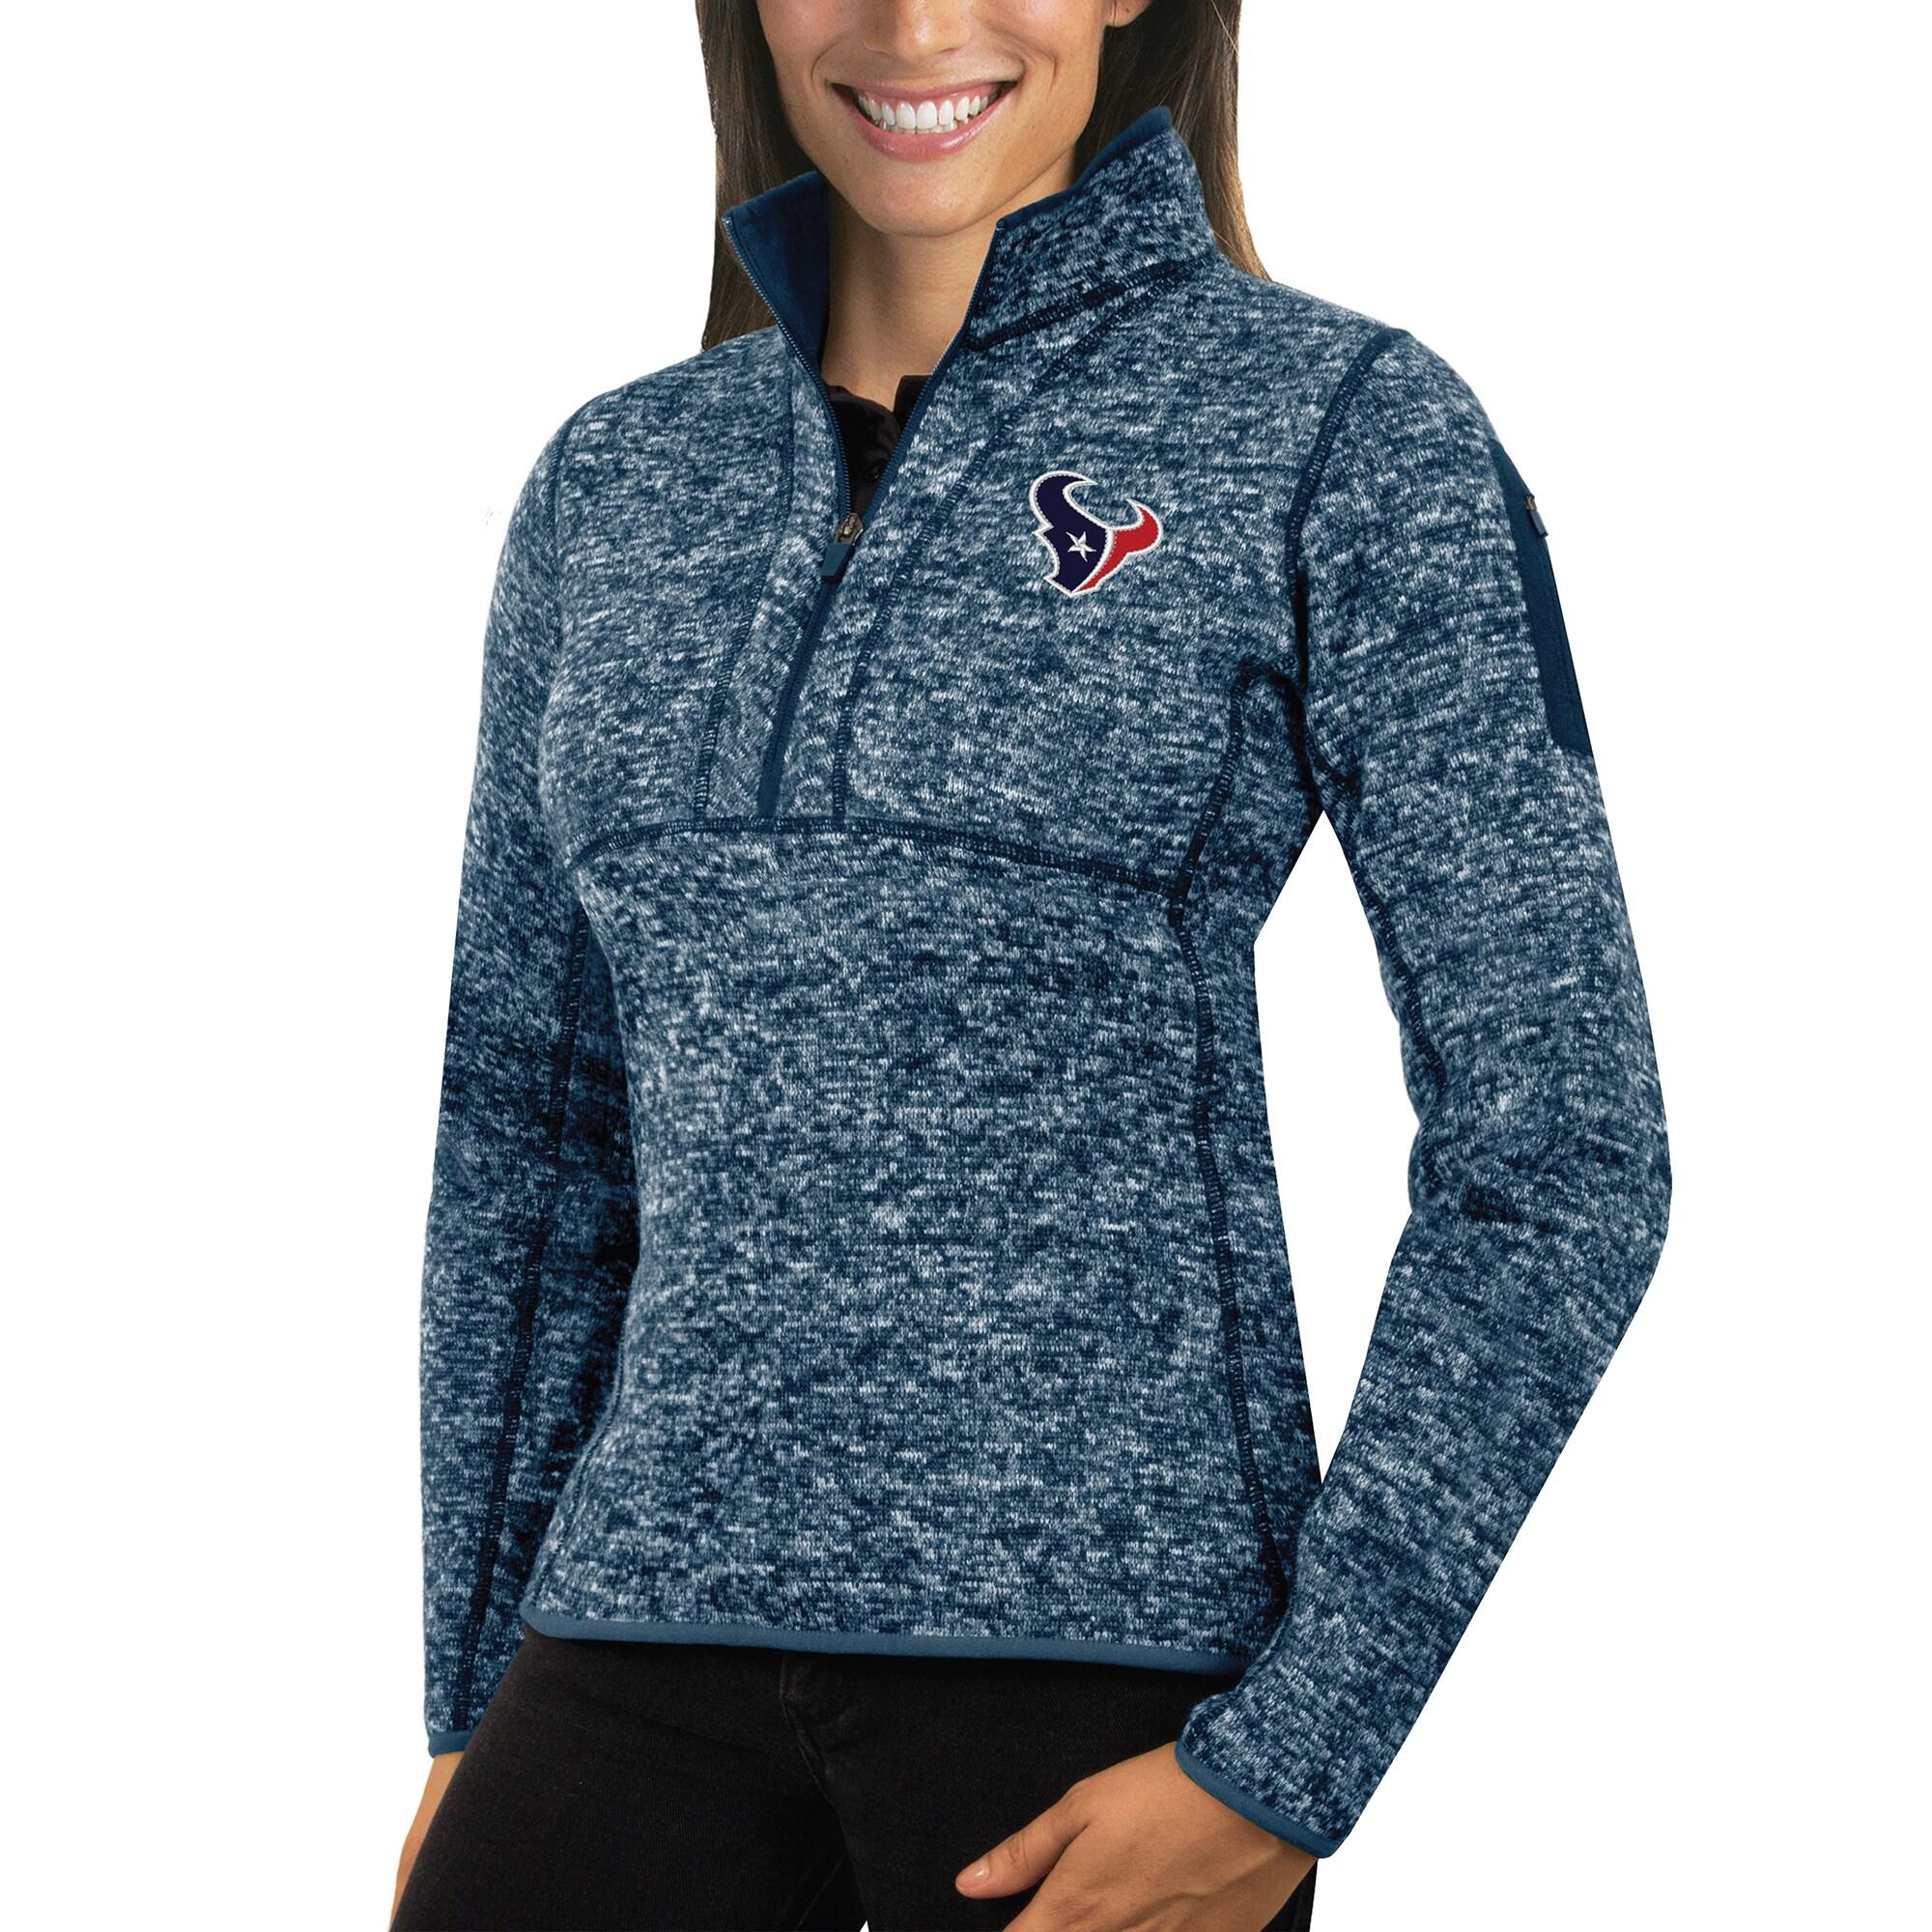 Houston Texans Antigua Women's Fortune Half-Zip Sweater - Heather Navy